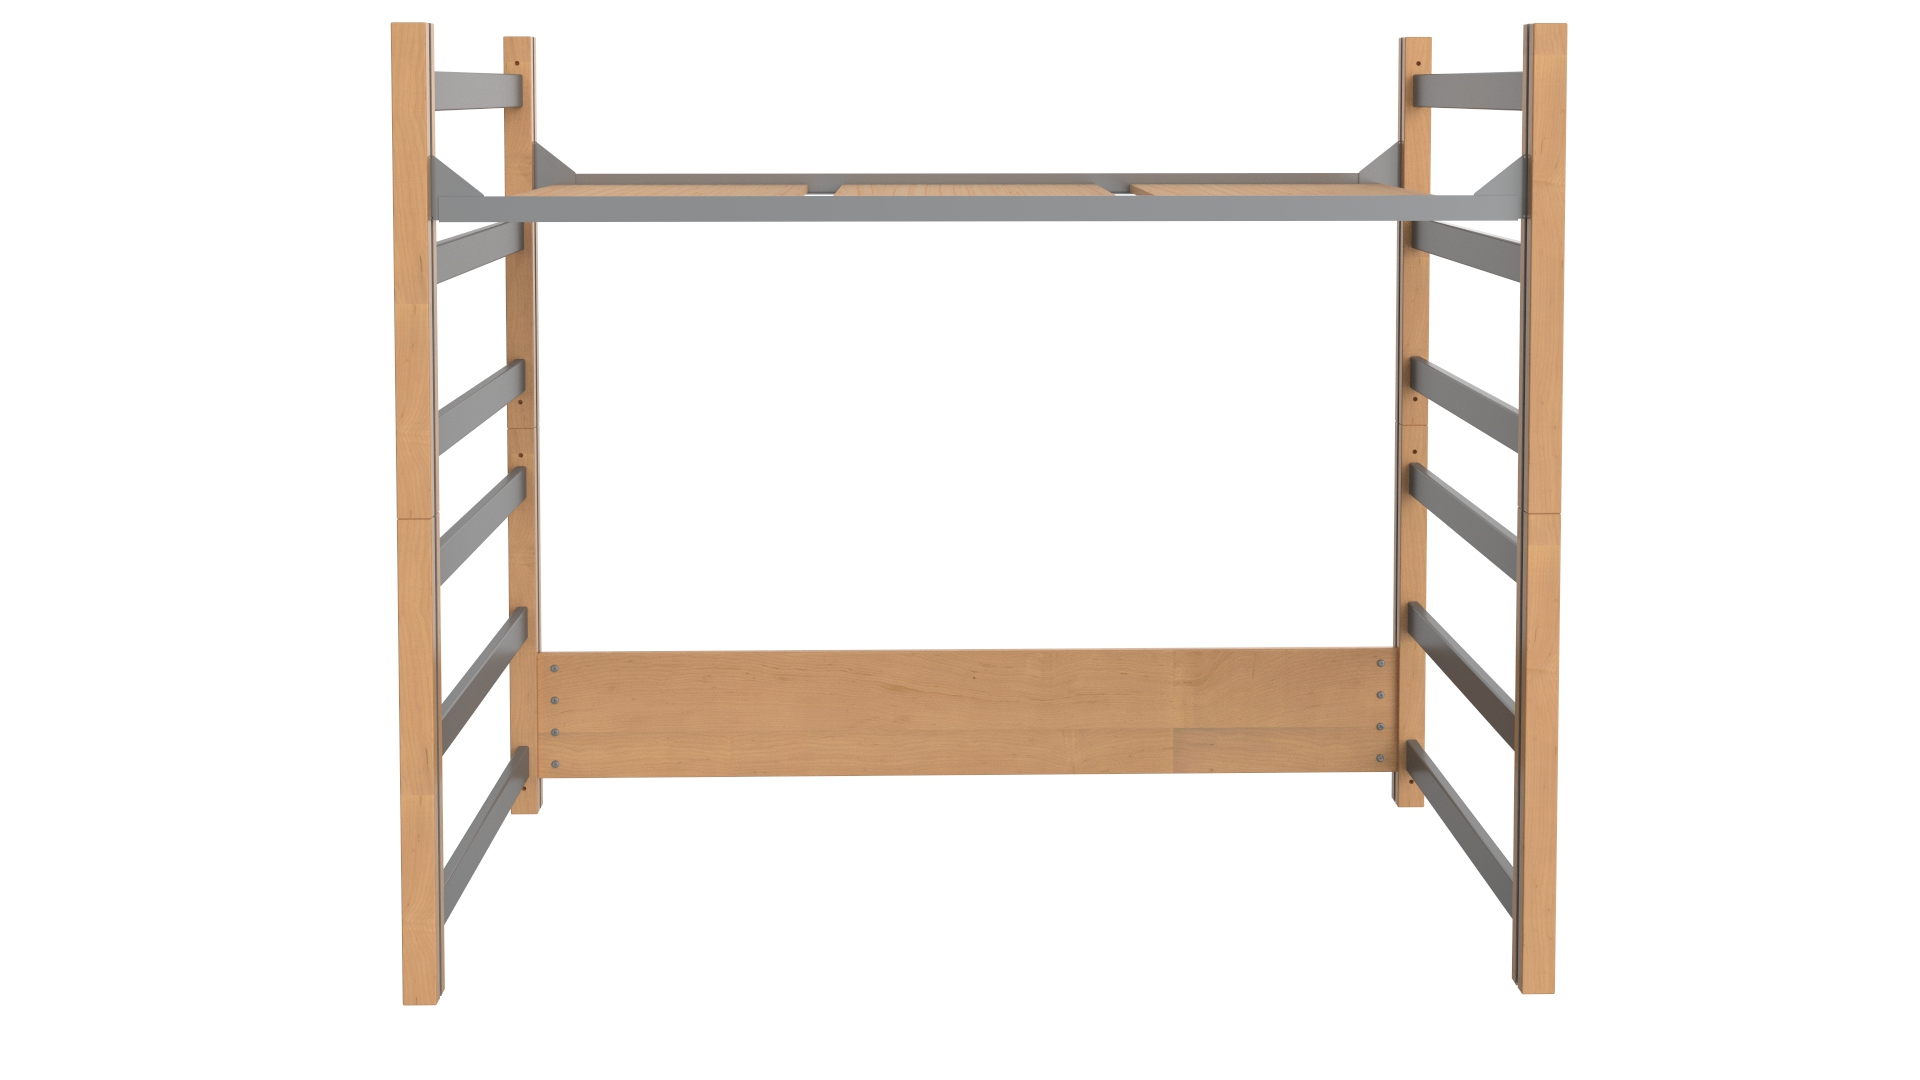 11 Position Loft bed Set